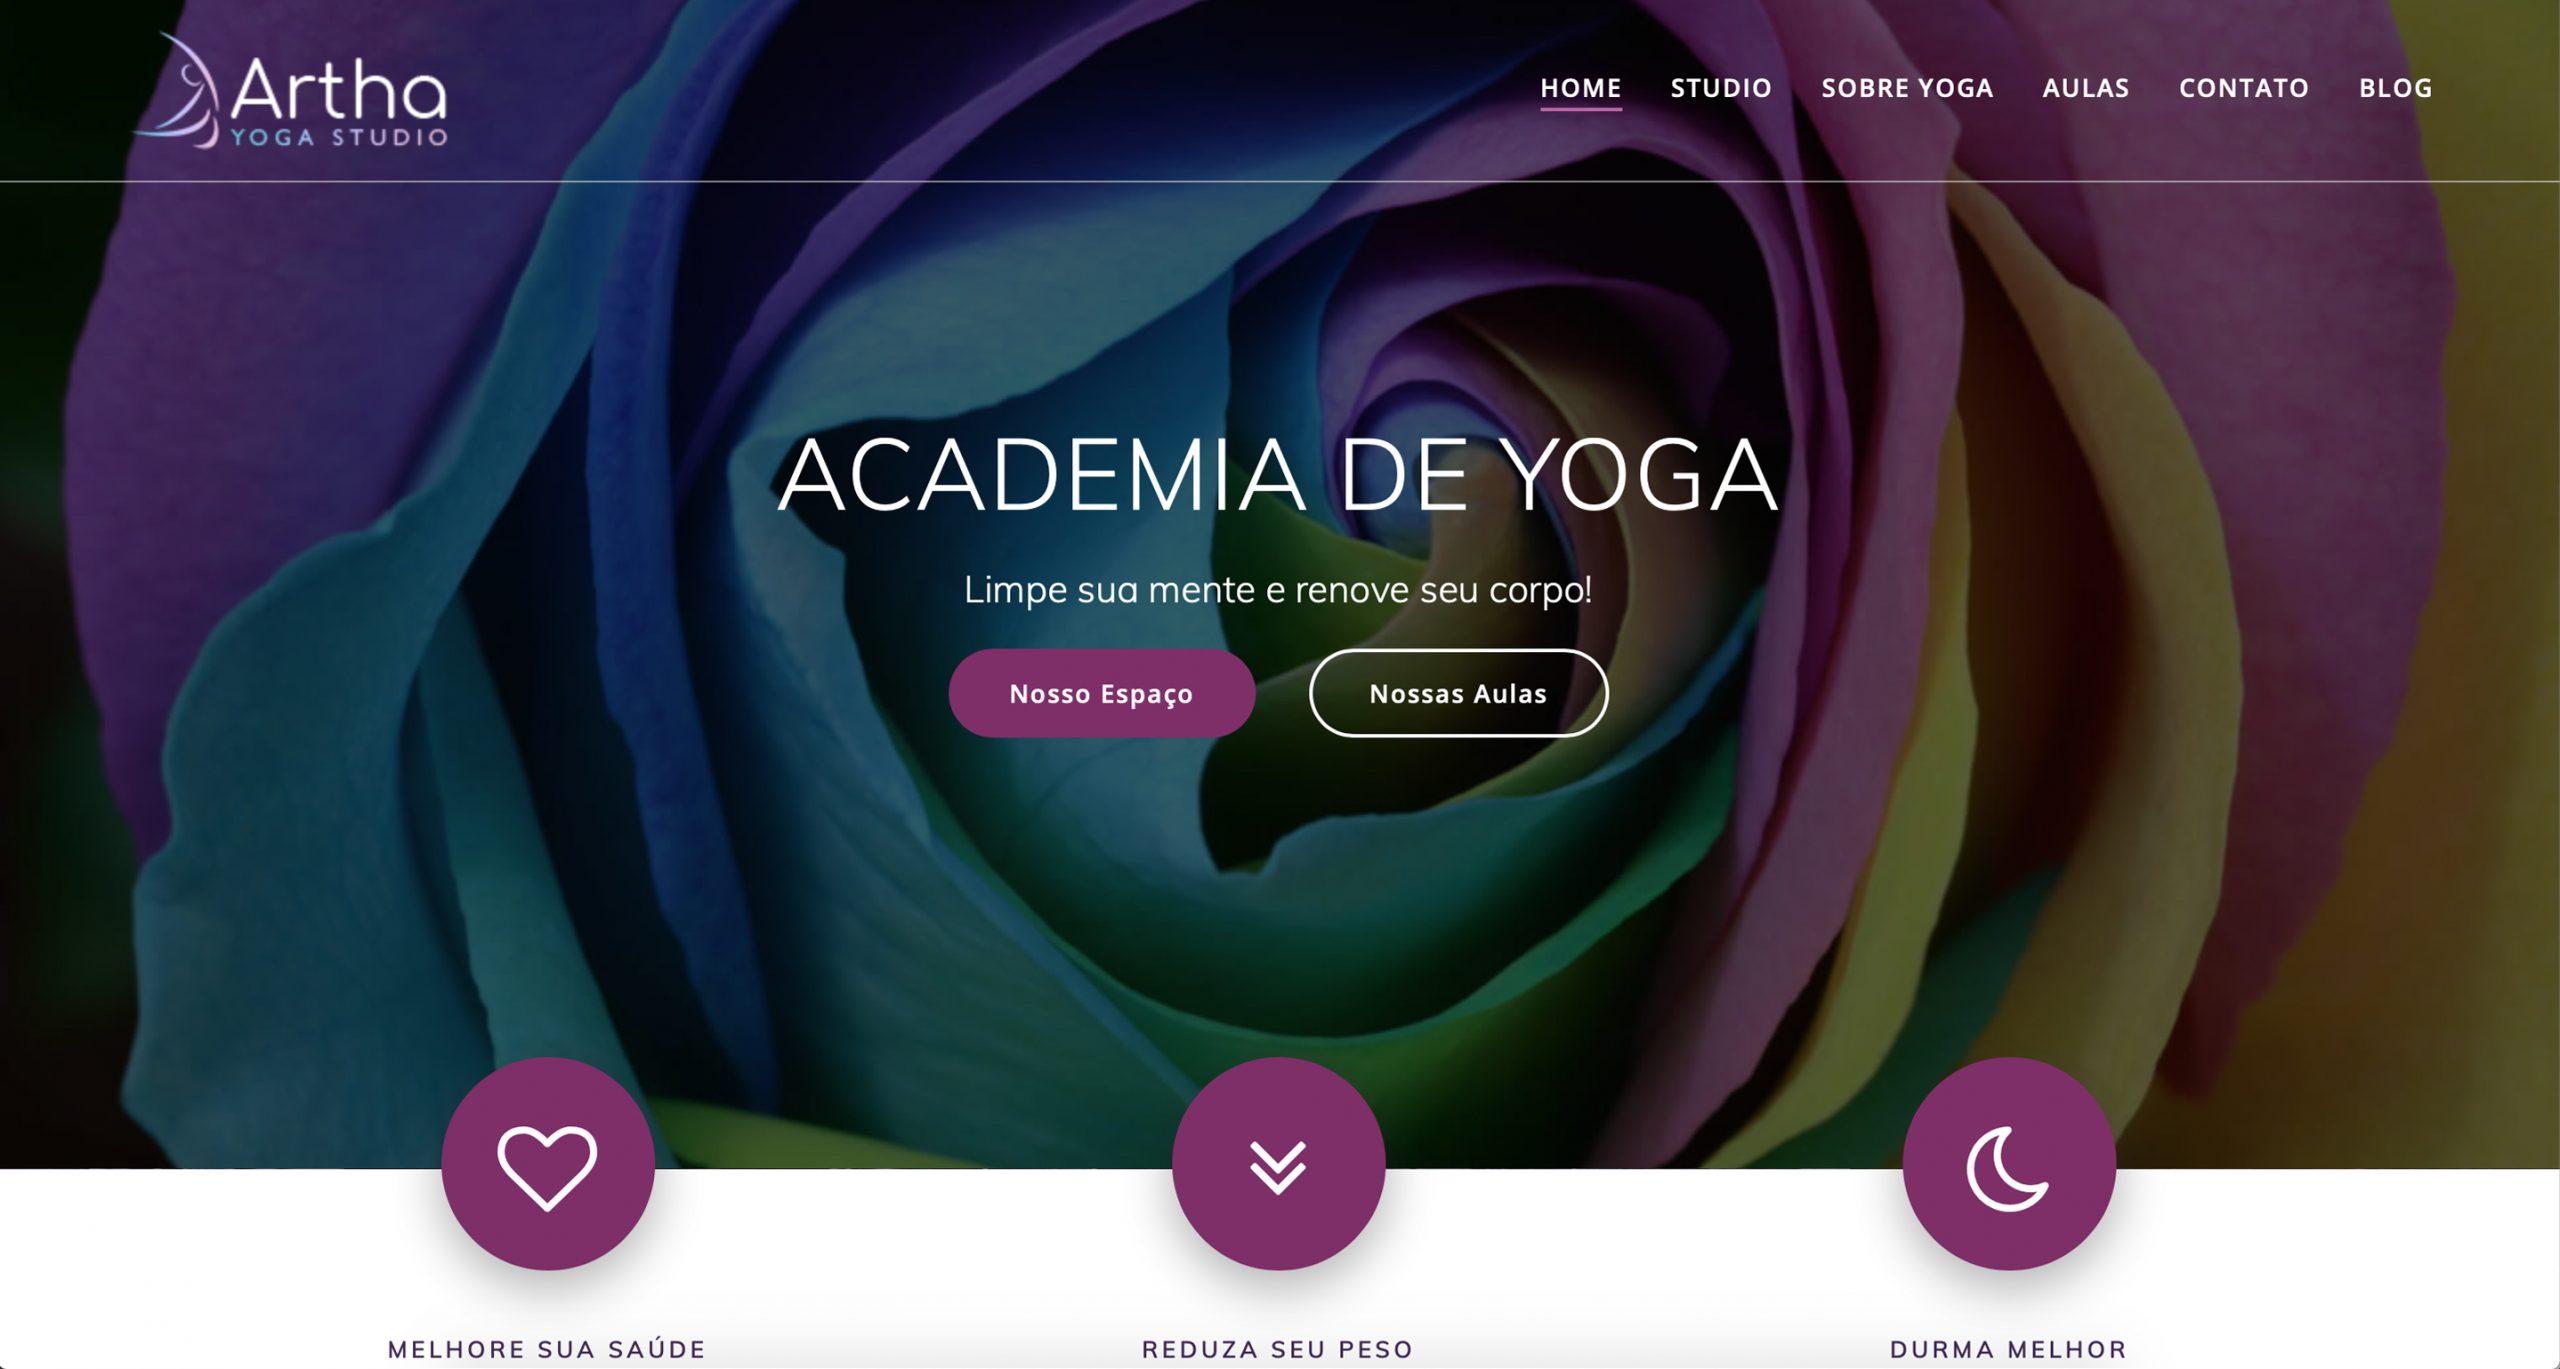 Artha Yoga